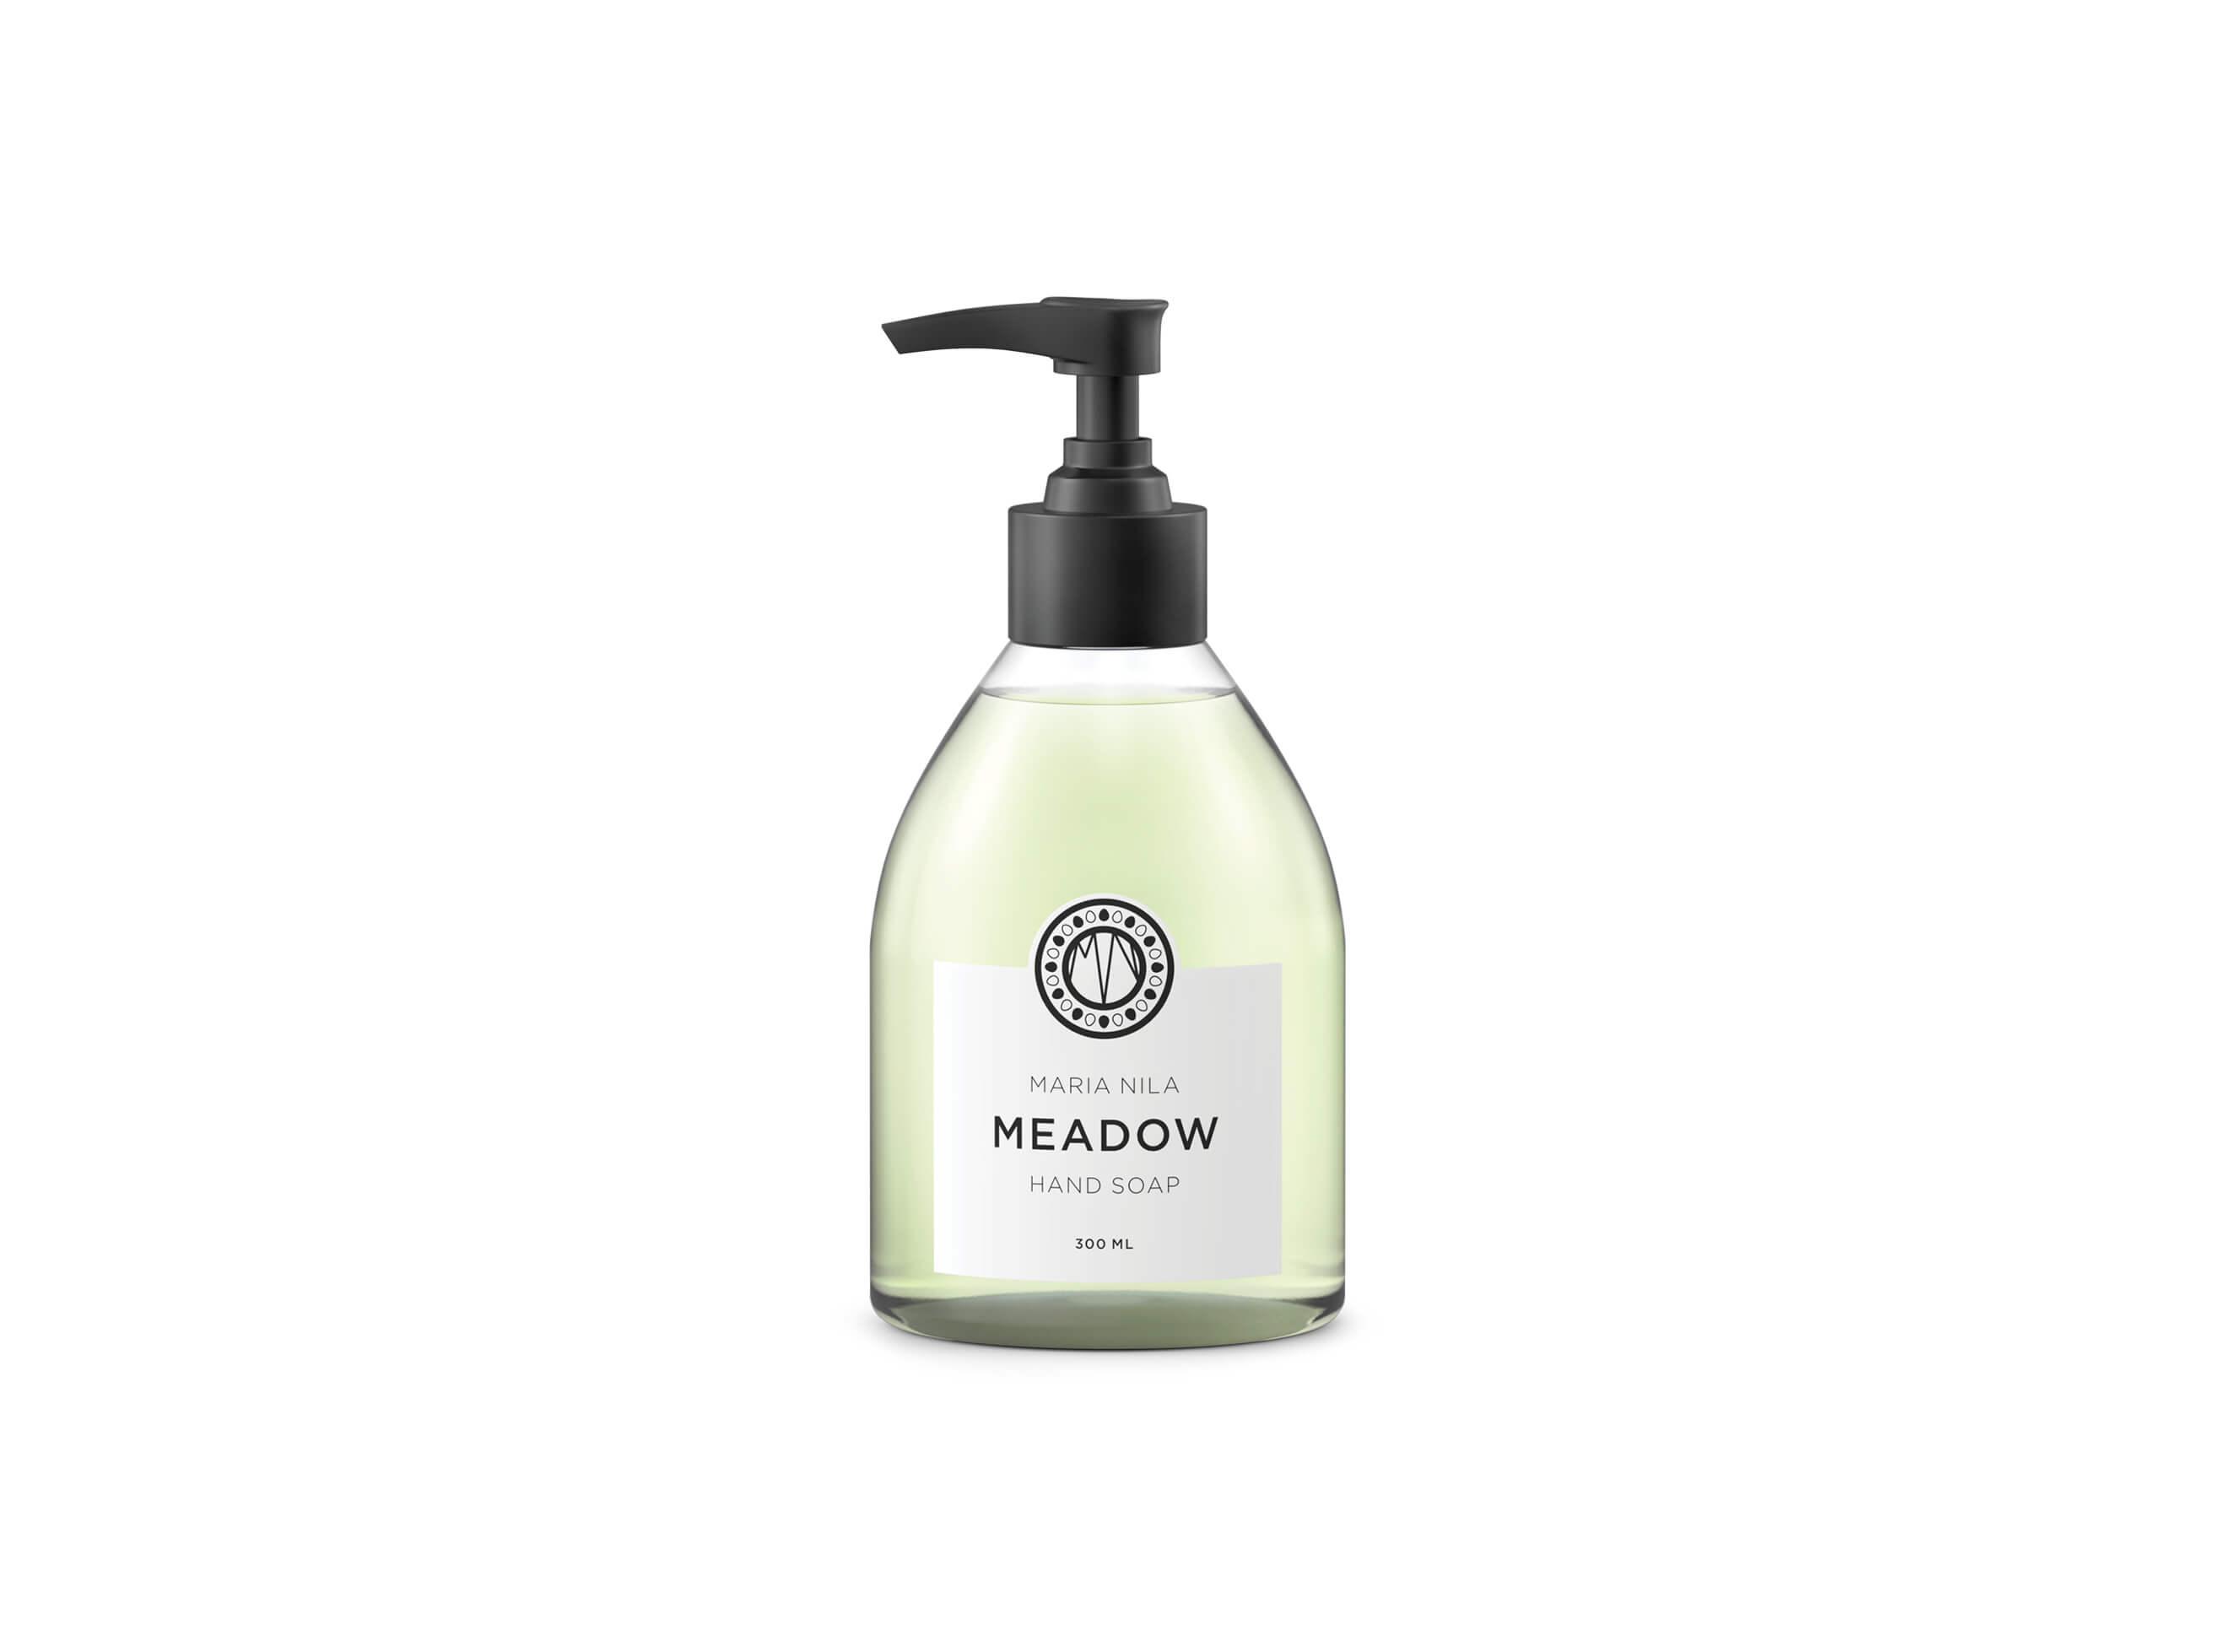 Maria Nila Meadow Hand Soap, 300 ml